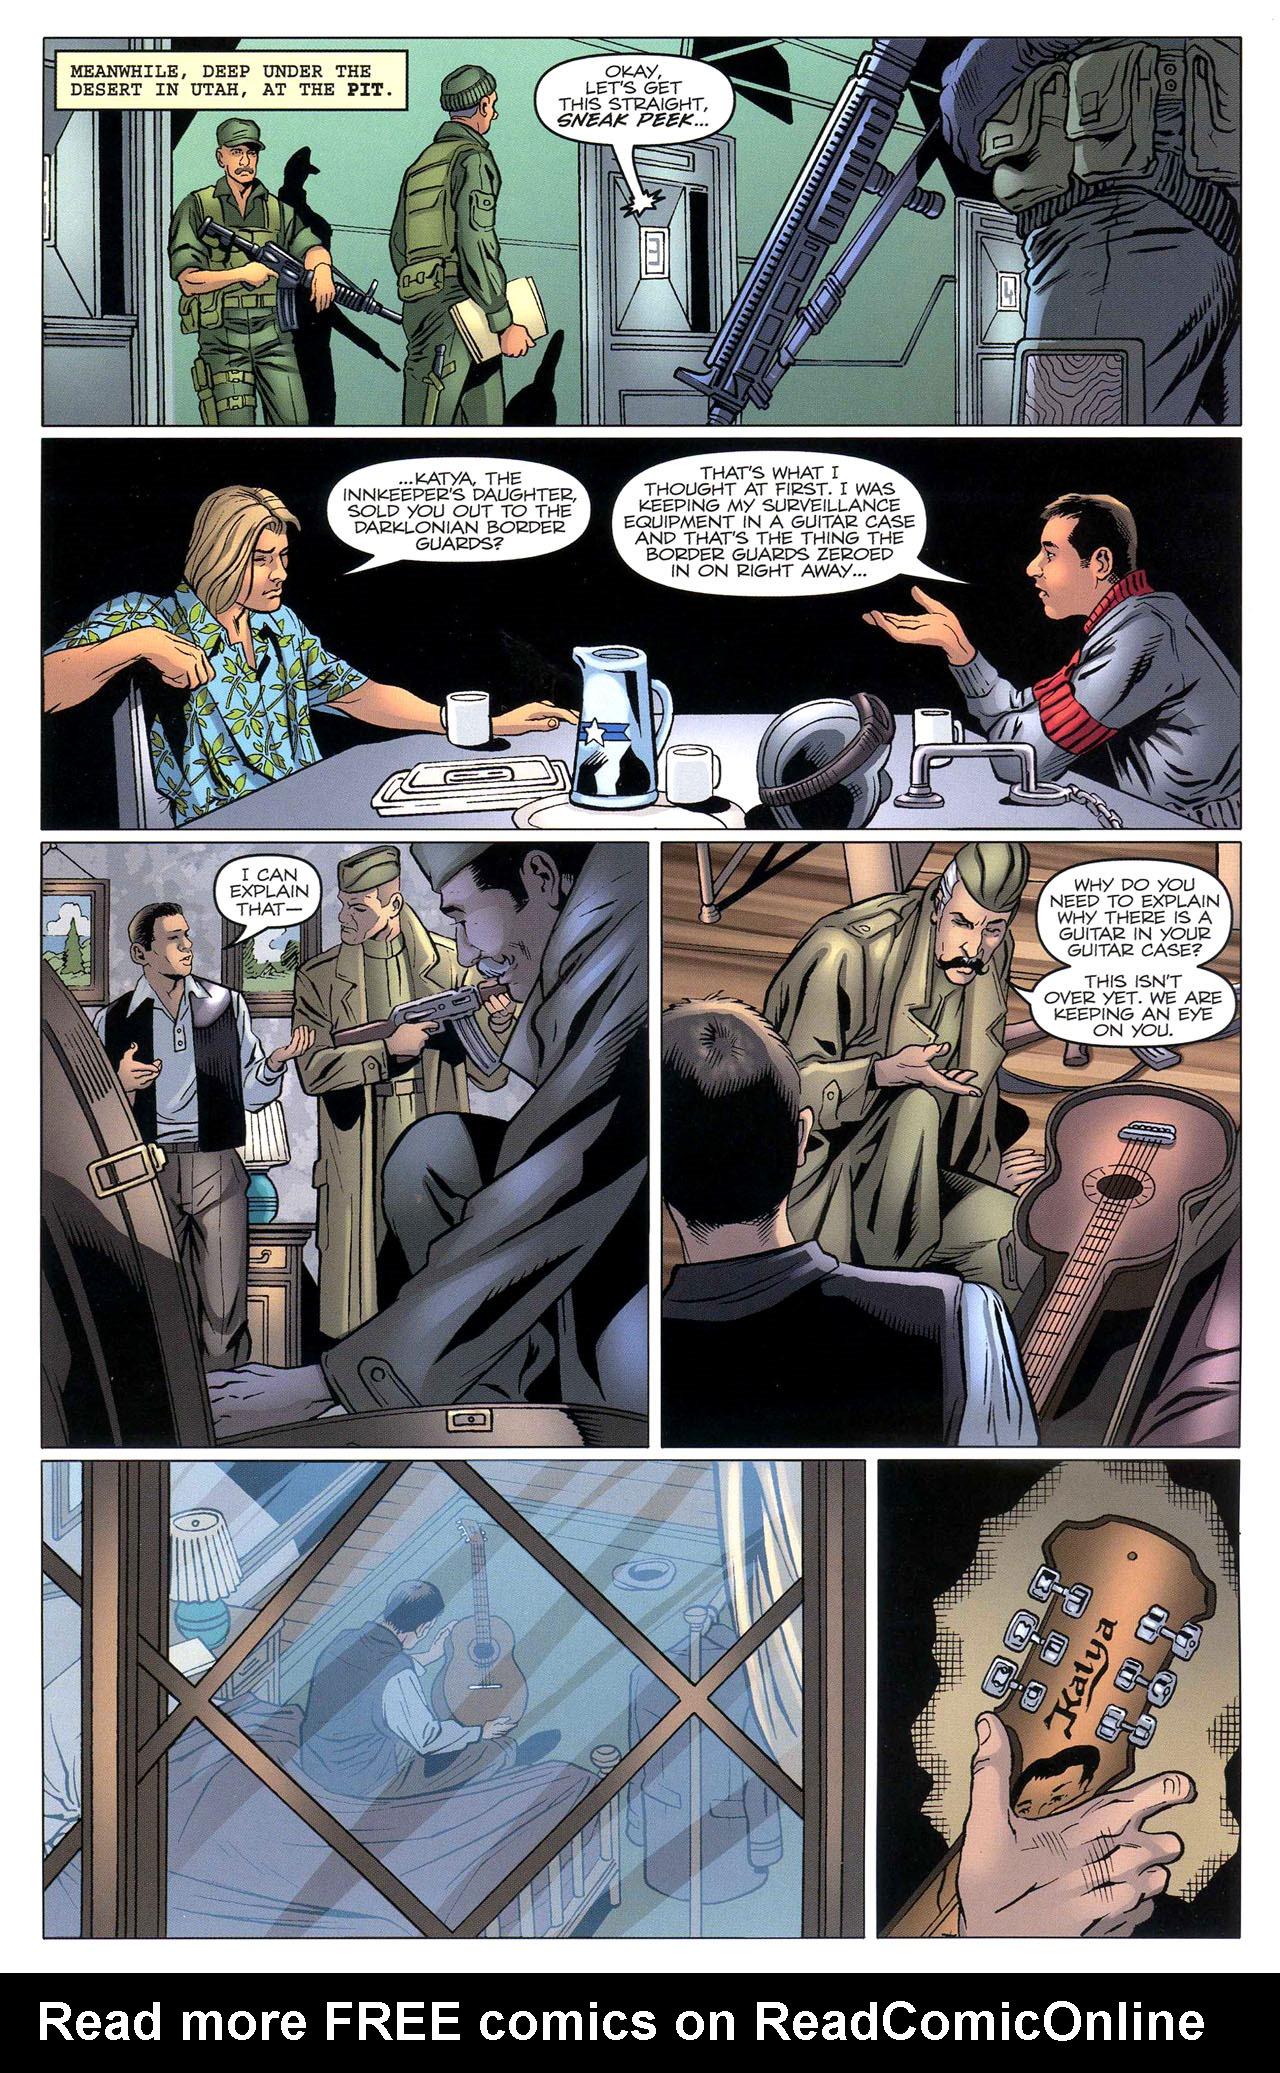 G.I. Joe: A Real American Hero 171 Page 2